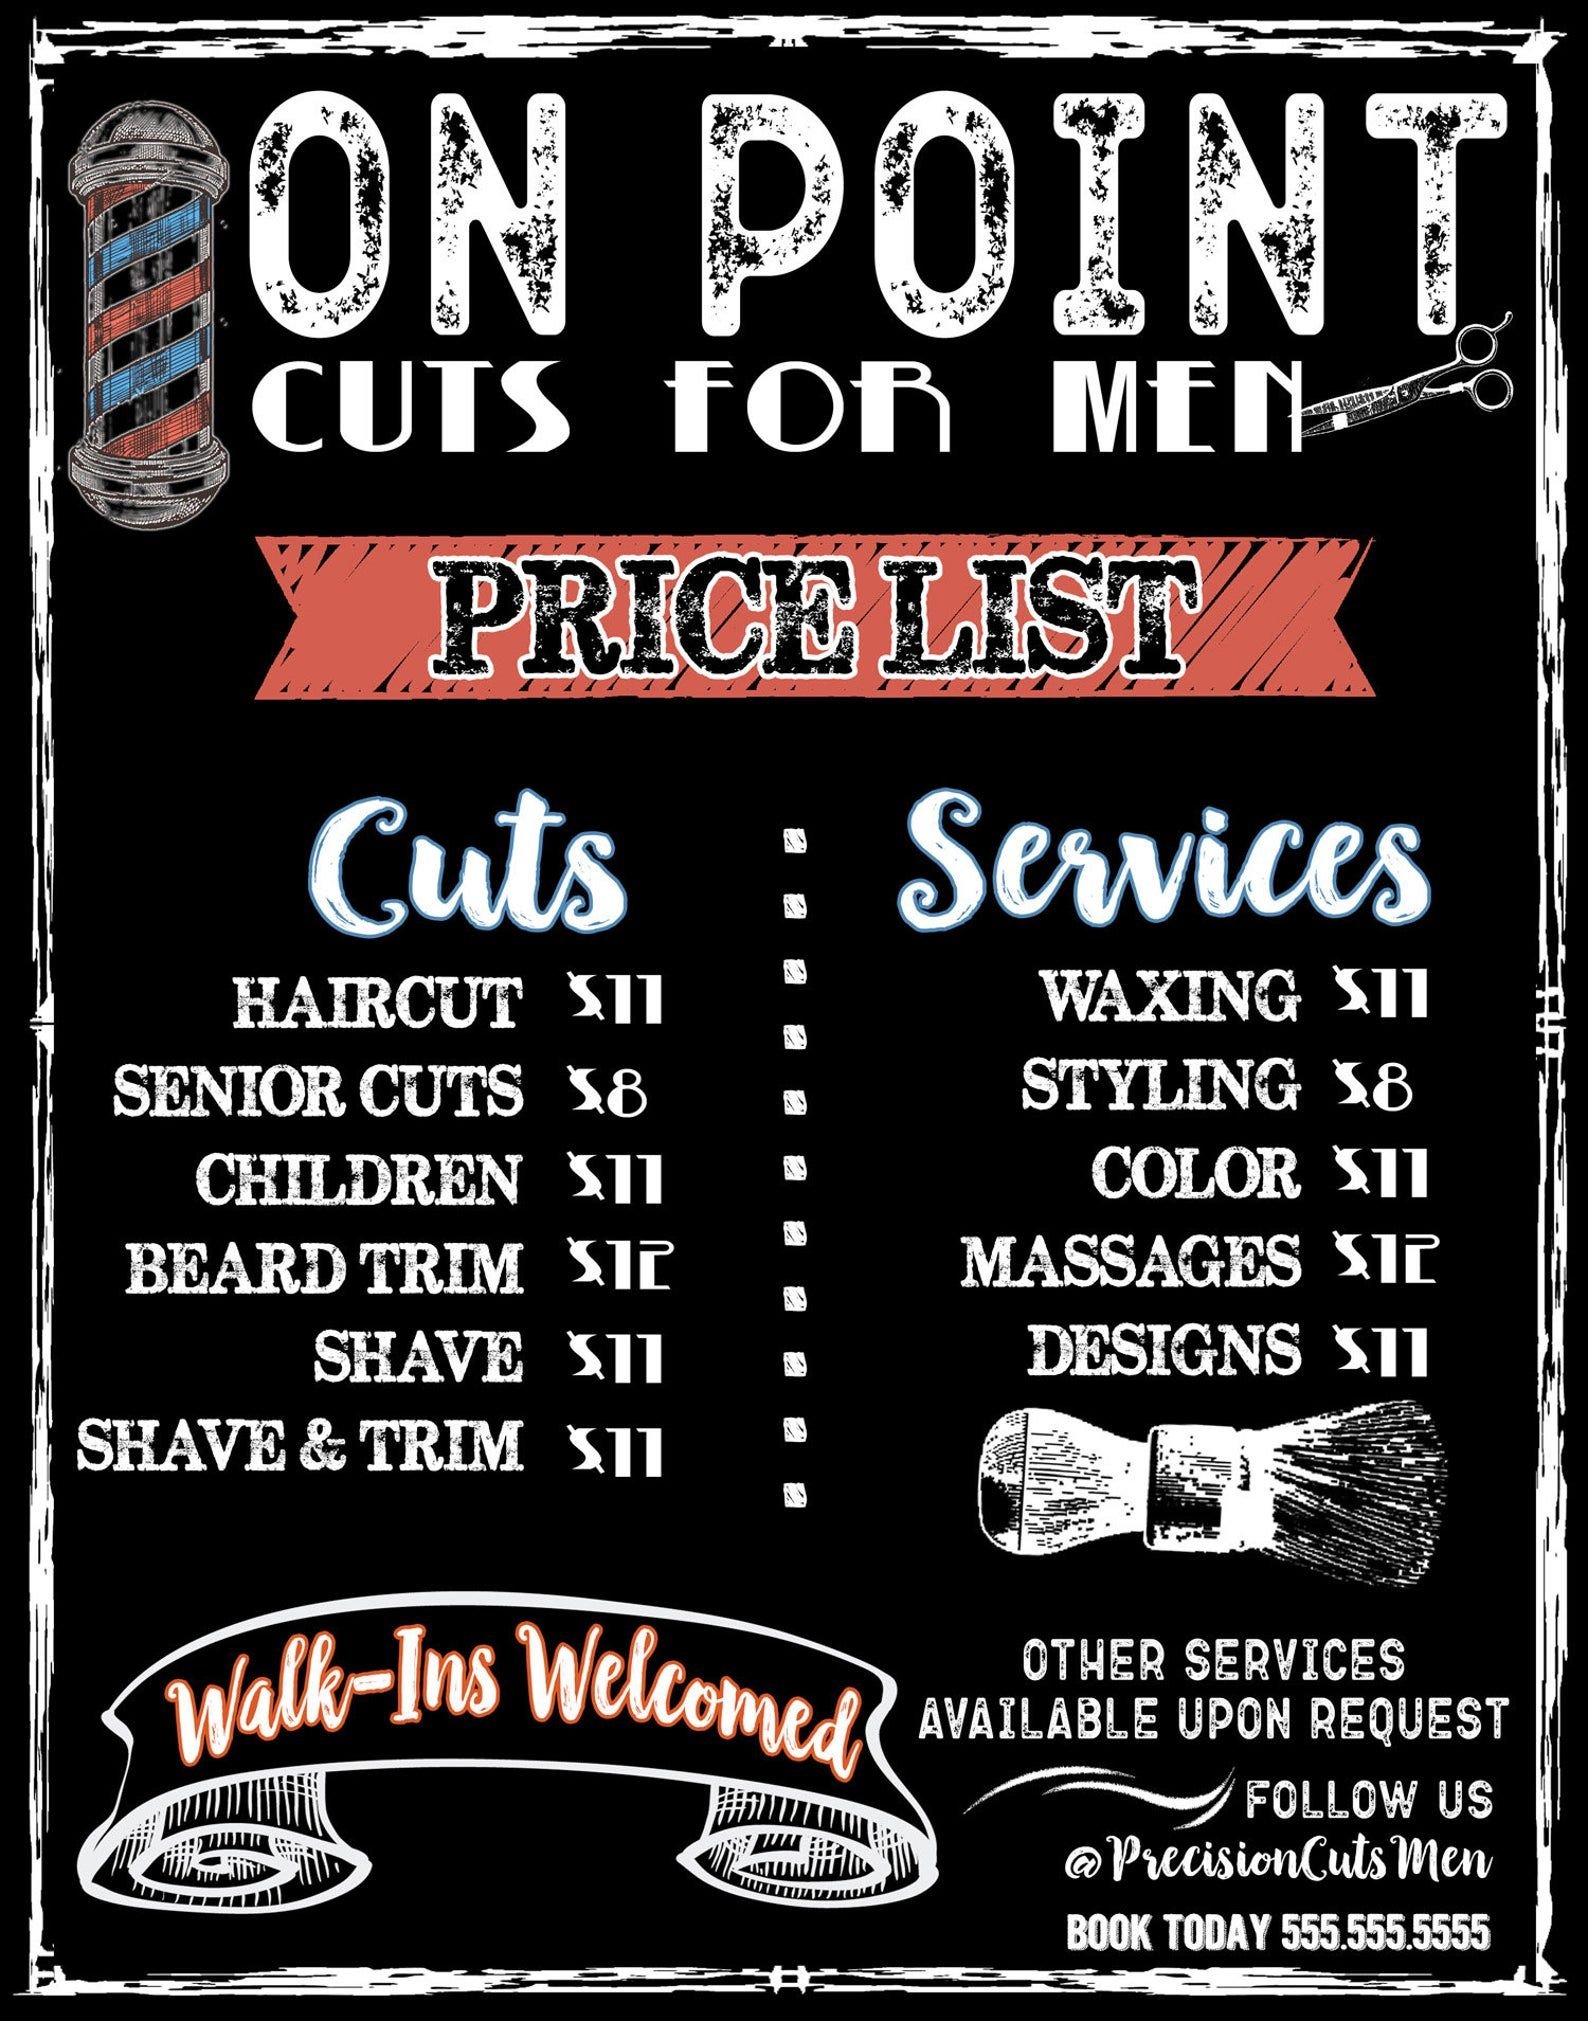 40+ Haircut and beard trim price ideas